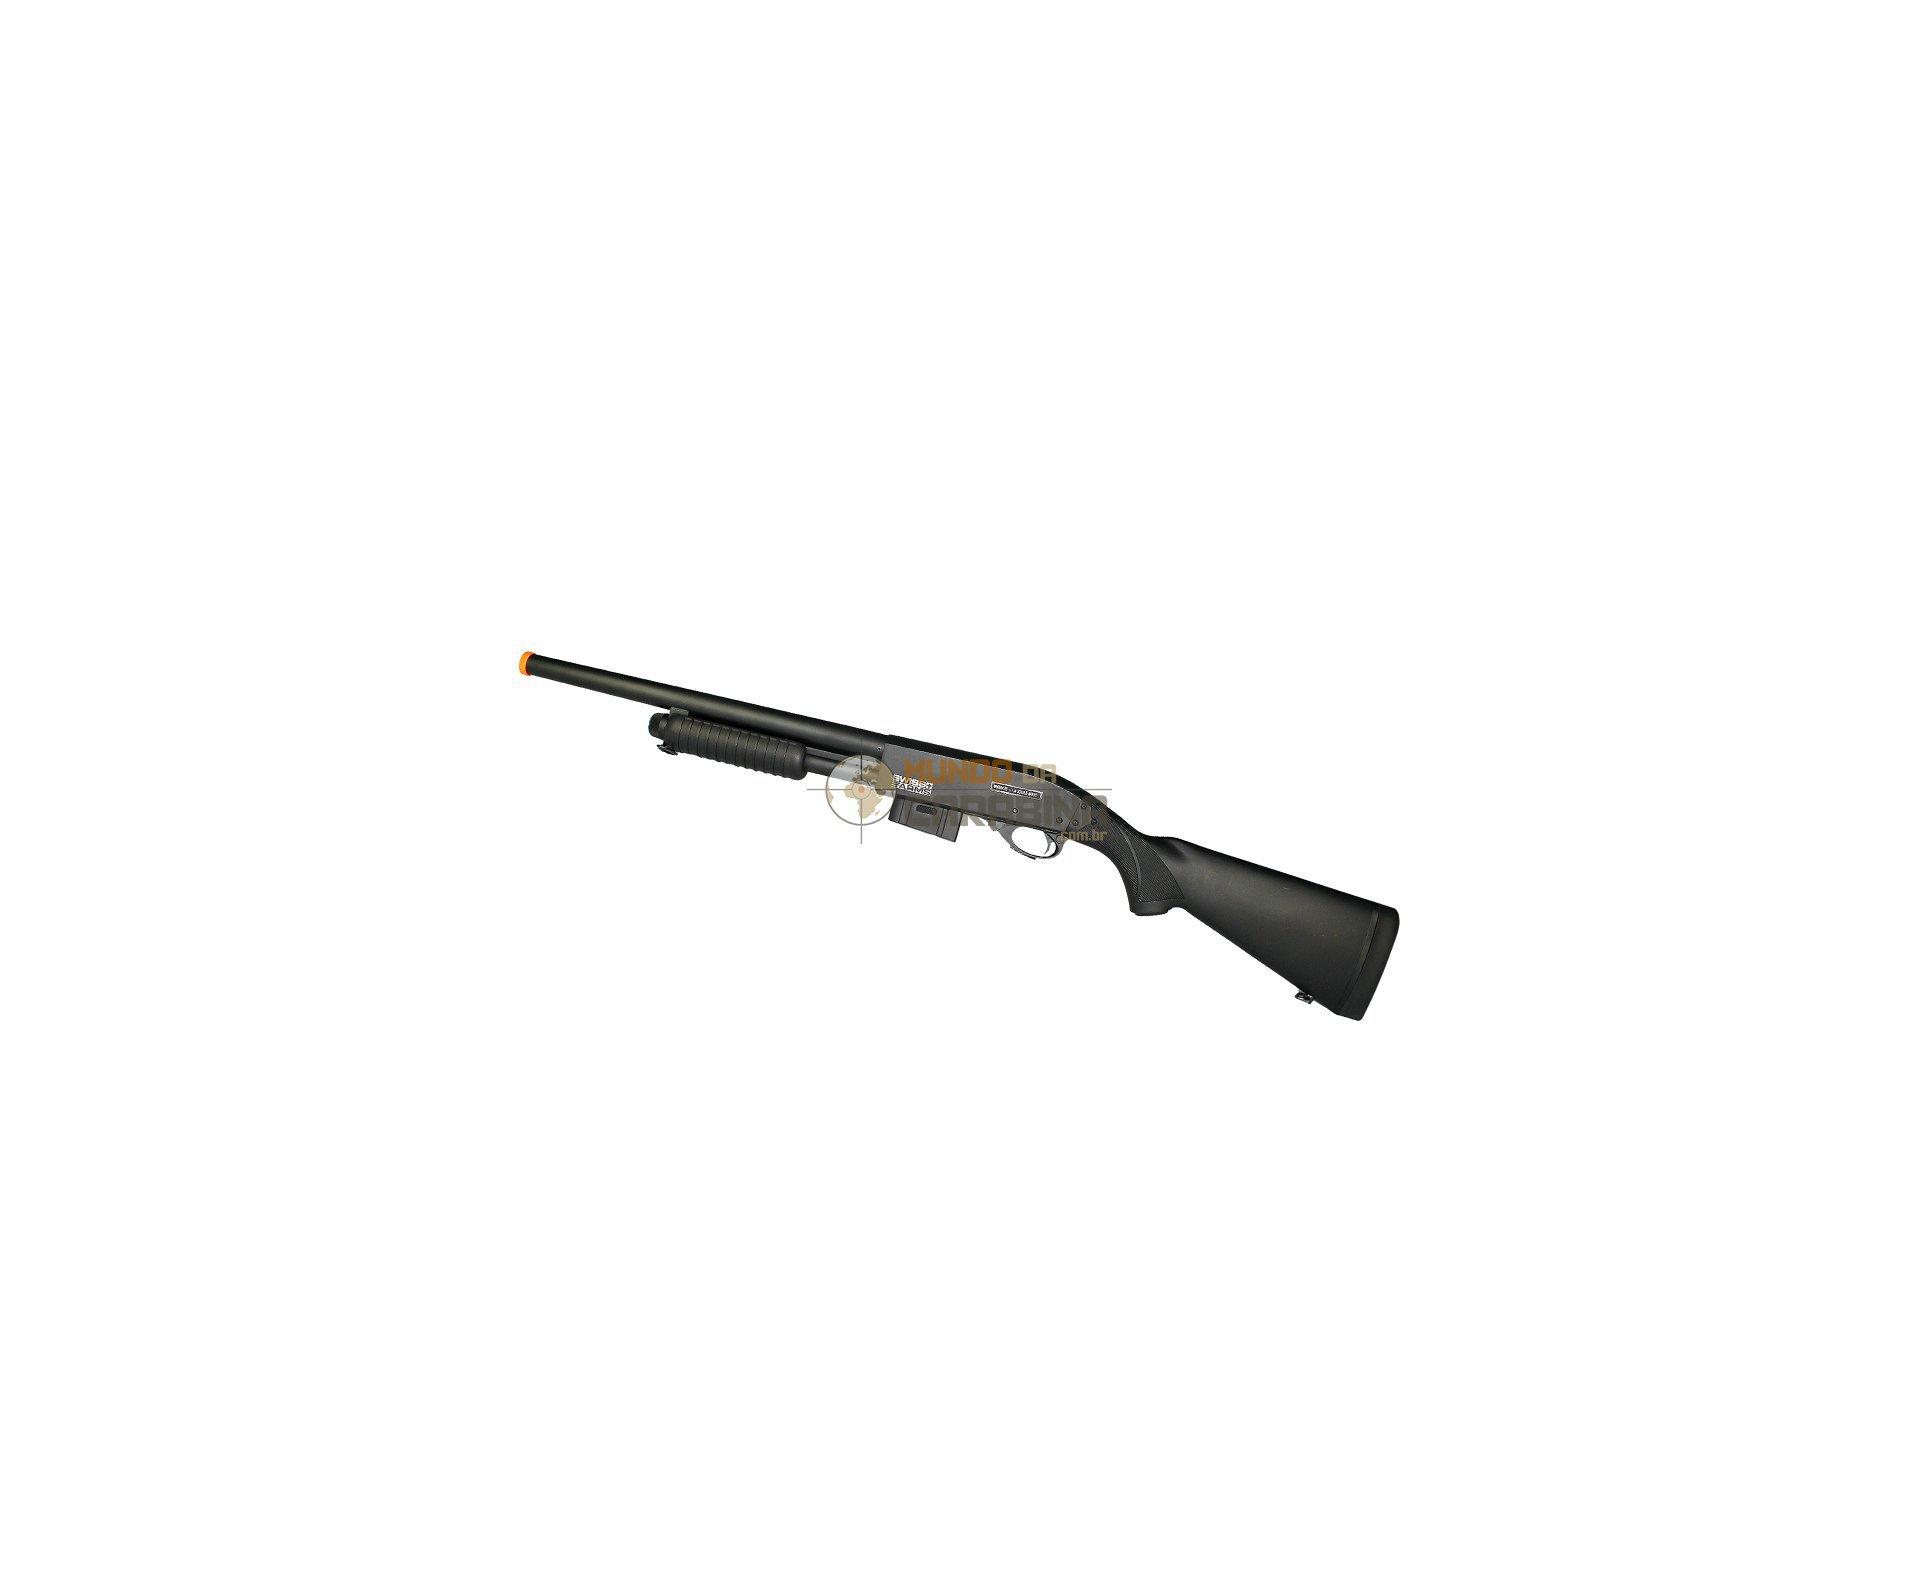 Shotgun Airsoft Sg Versão Longa - Full Metal - 6,0 Mm - Swiss Arms